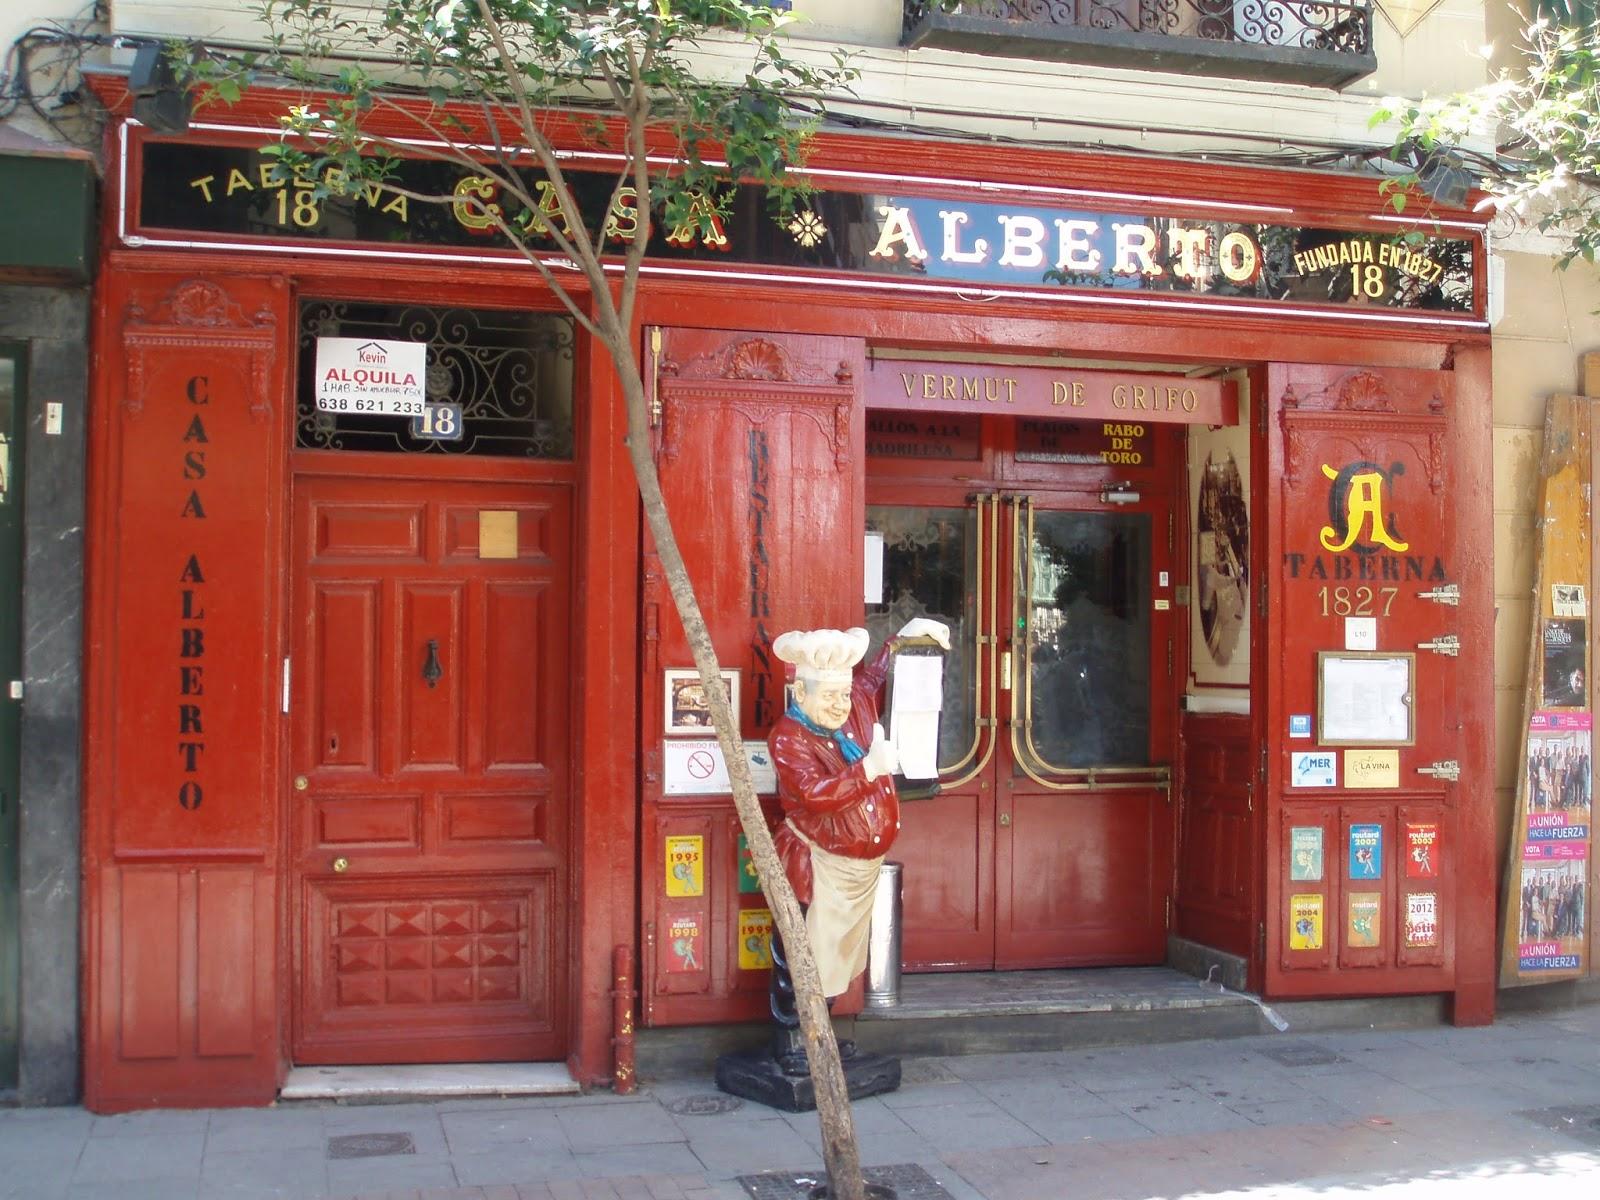 Ruta taurina por madrid 1 - Carniceria en madrid ...